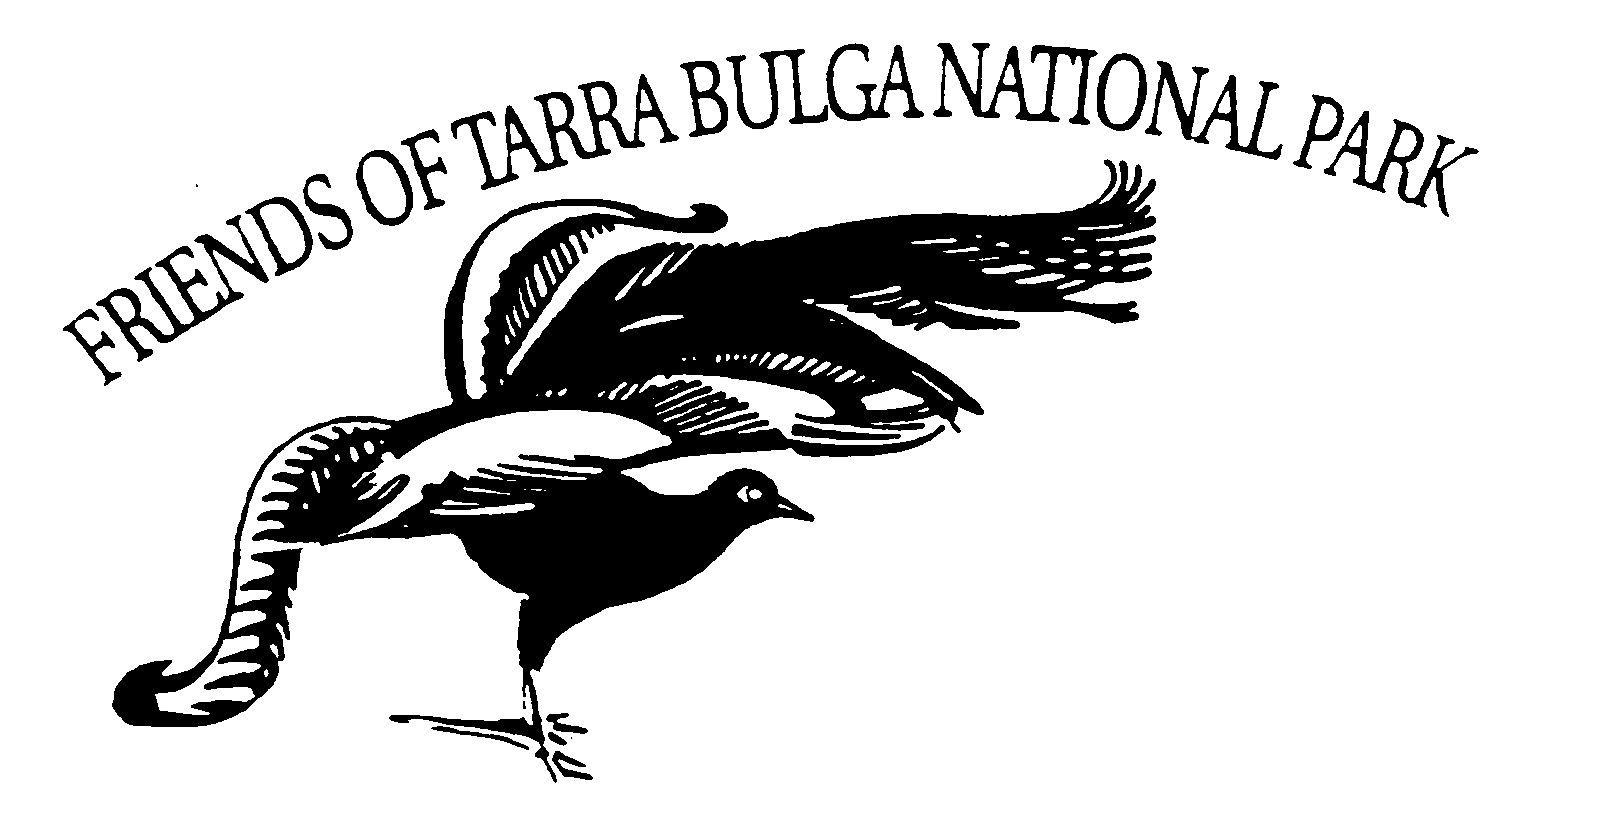 Friends of Tarra-Bulga National Park